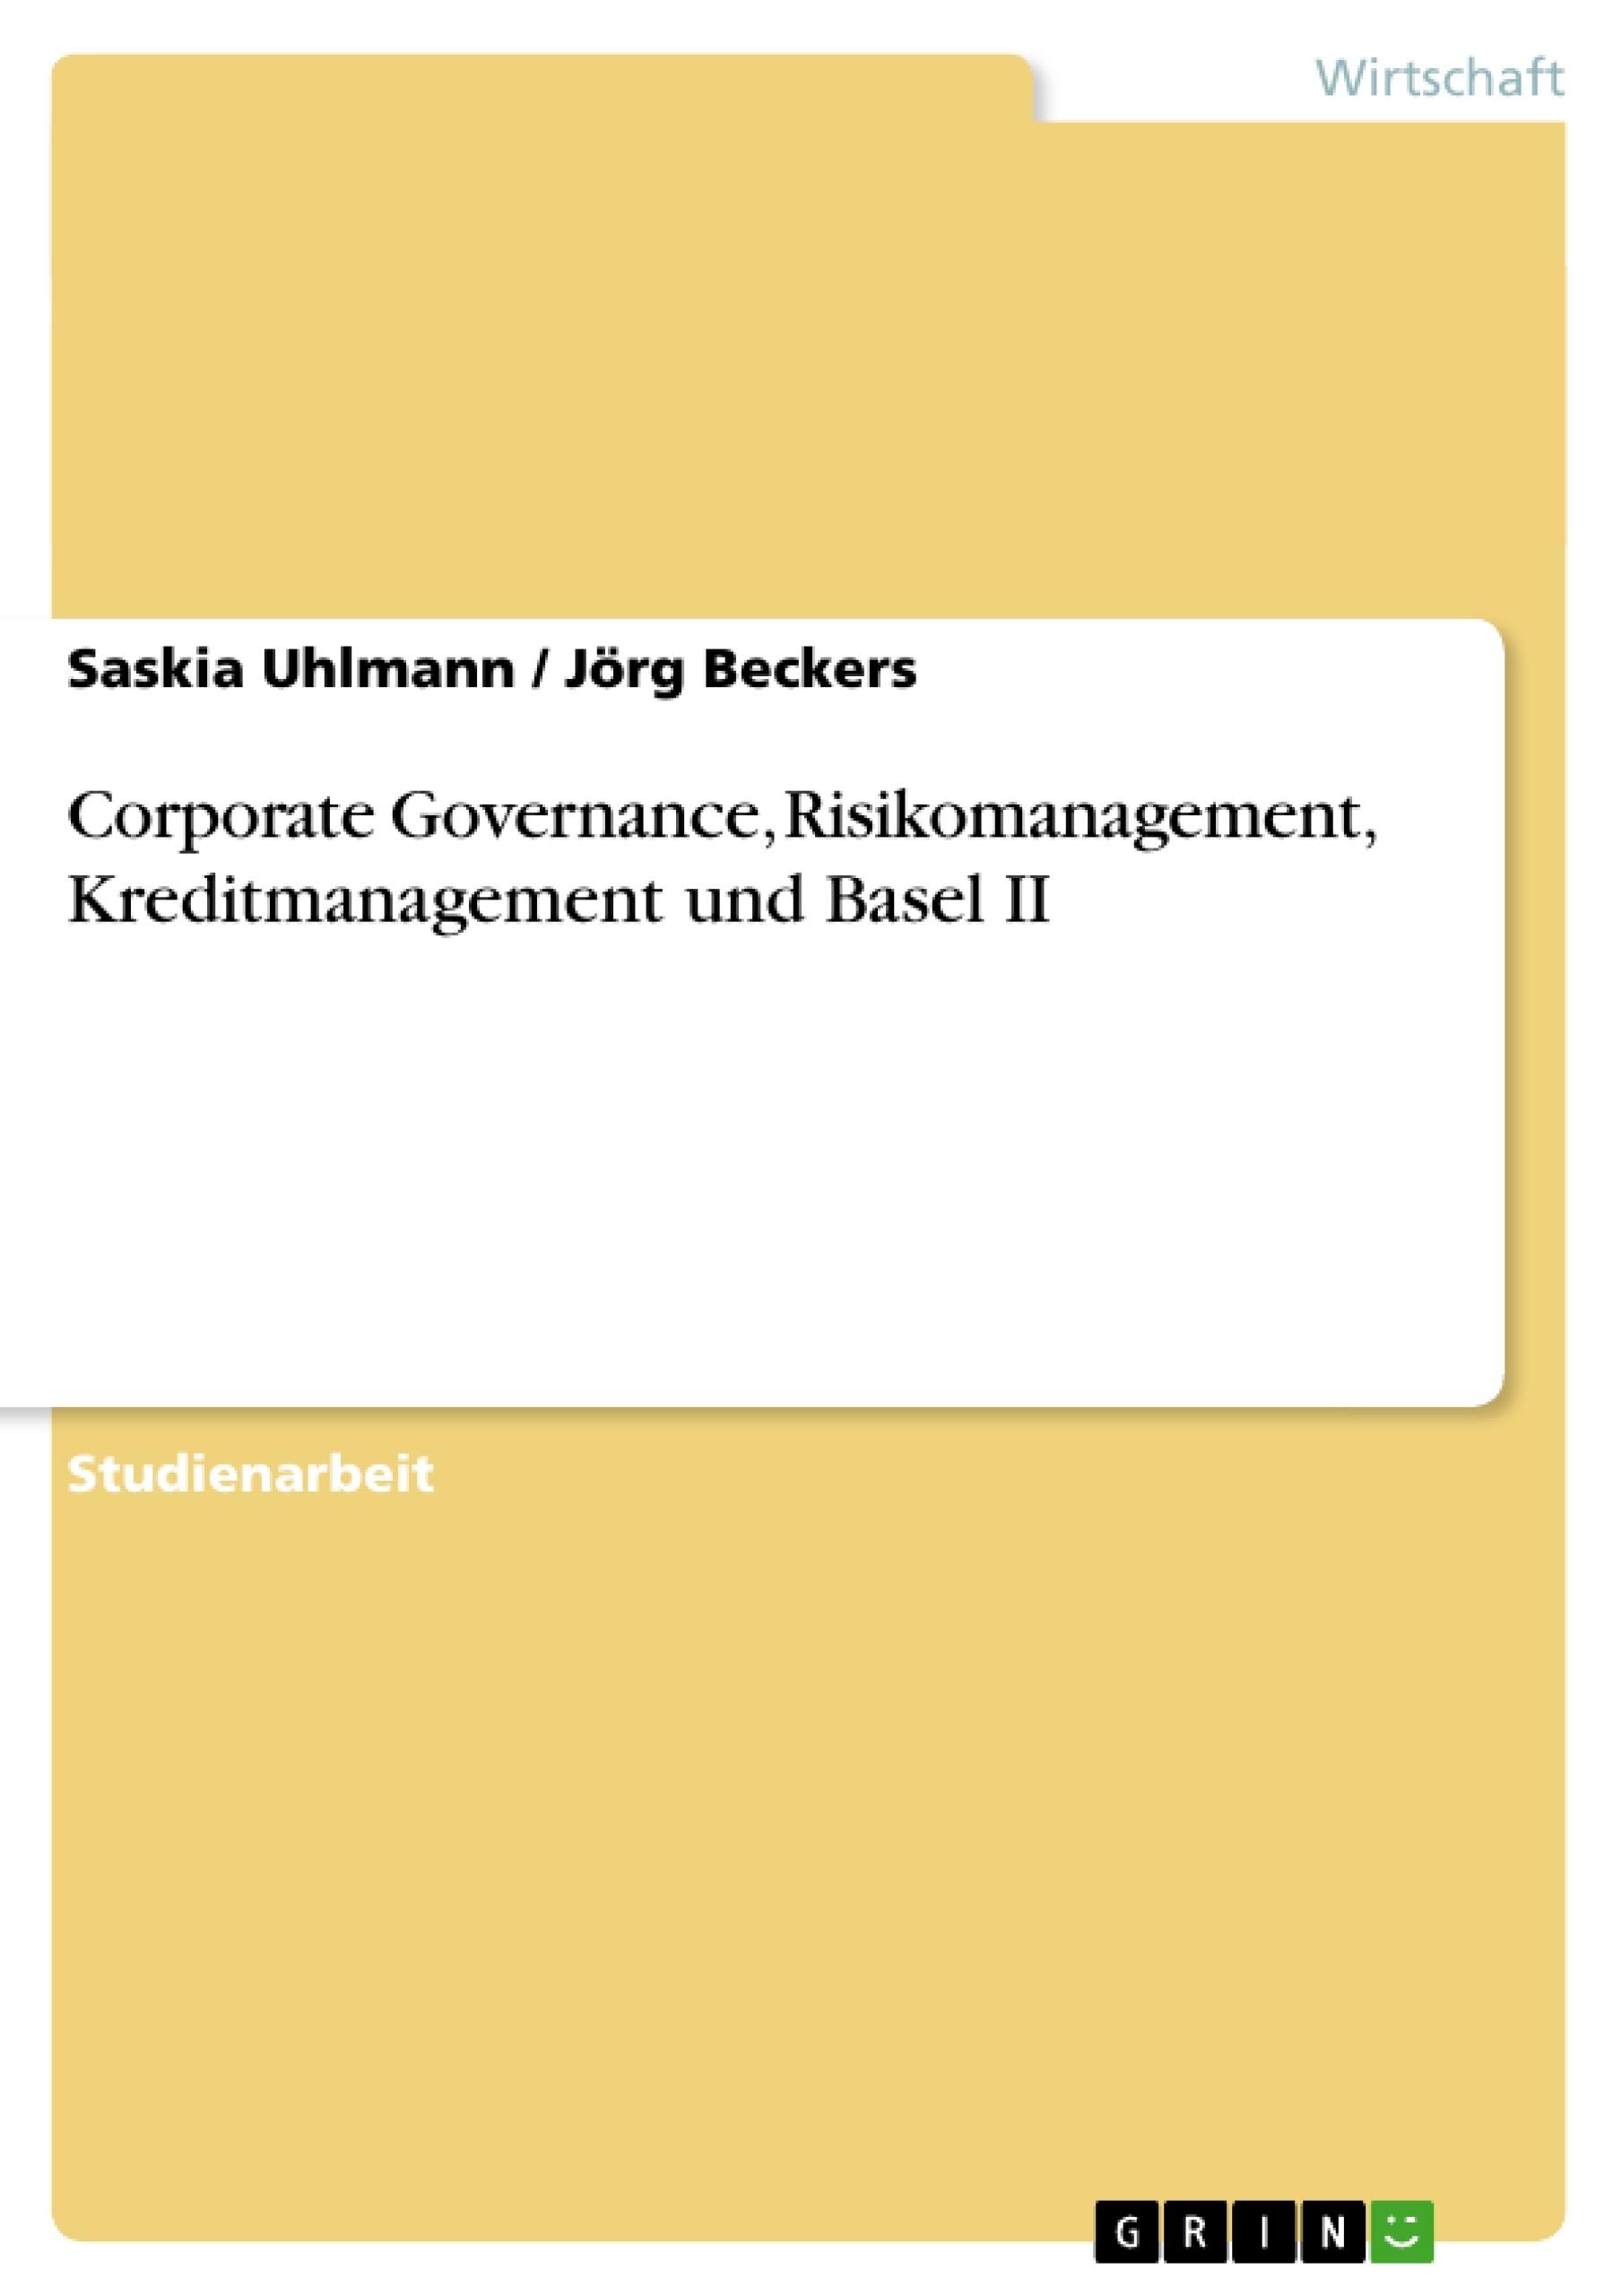 Titel: Corporate Governance, Risikomanagement, Kreditmanagement und Basel II